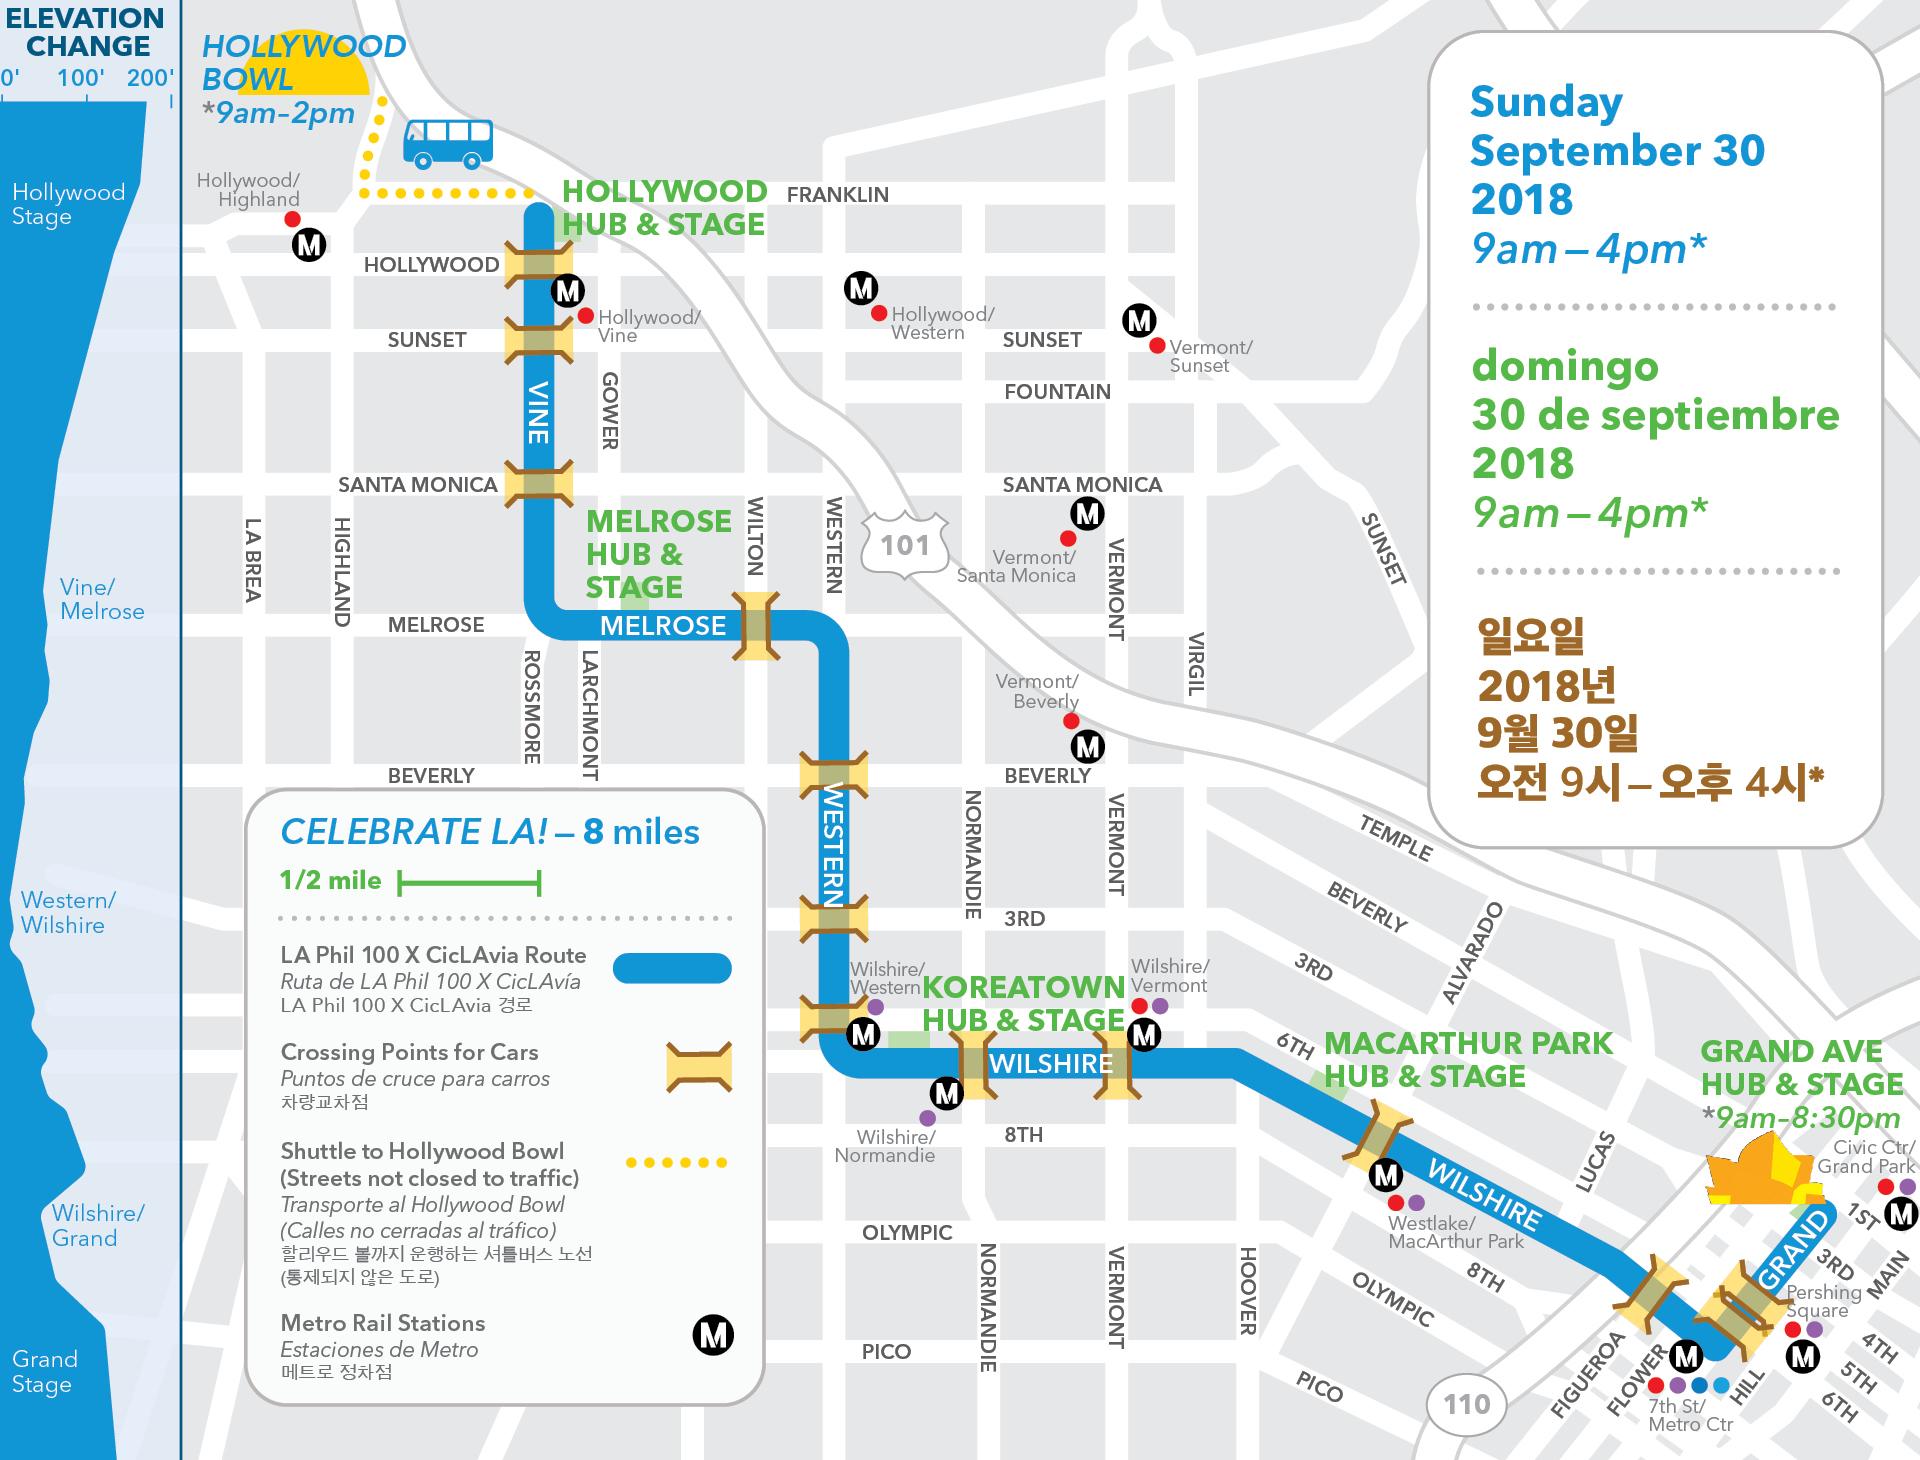 Disney Los Angeles Map.La Phil 100 Celebrate La A Free Festival Concert 9 30